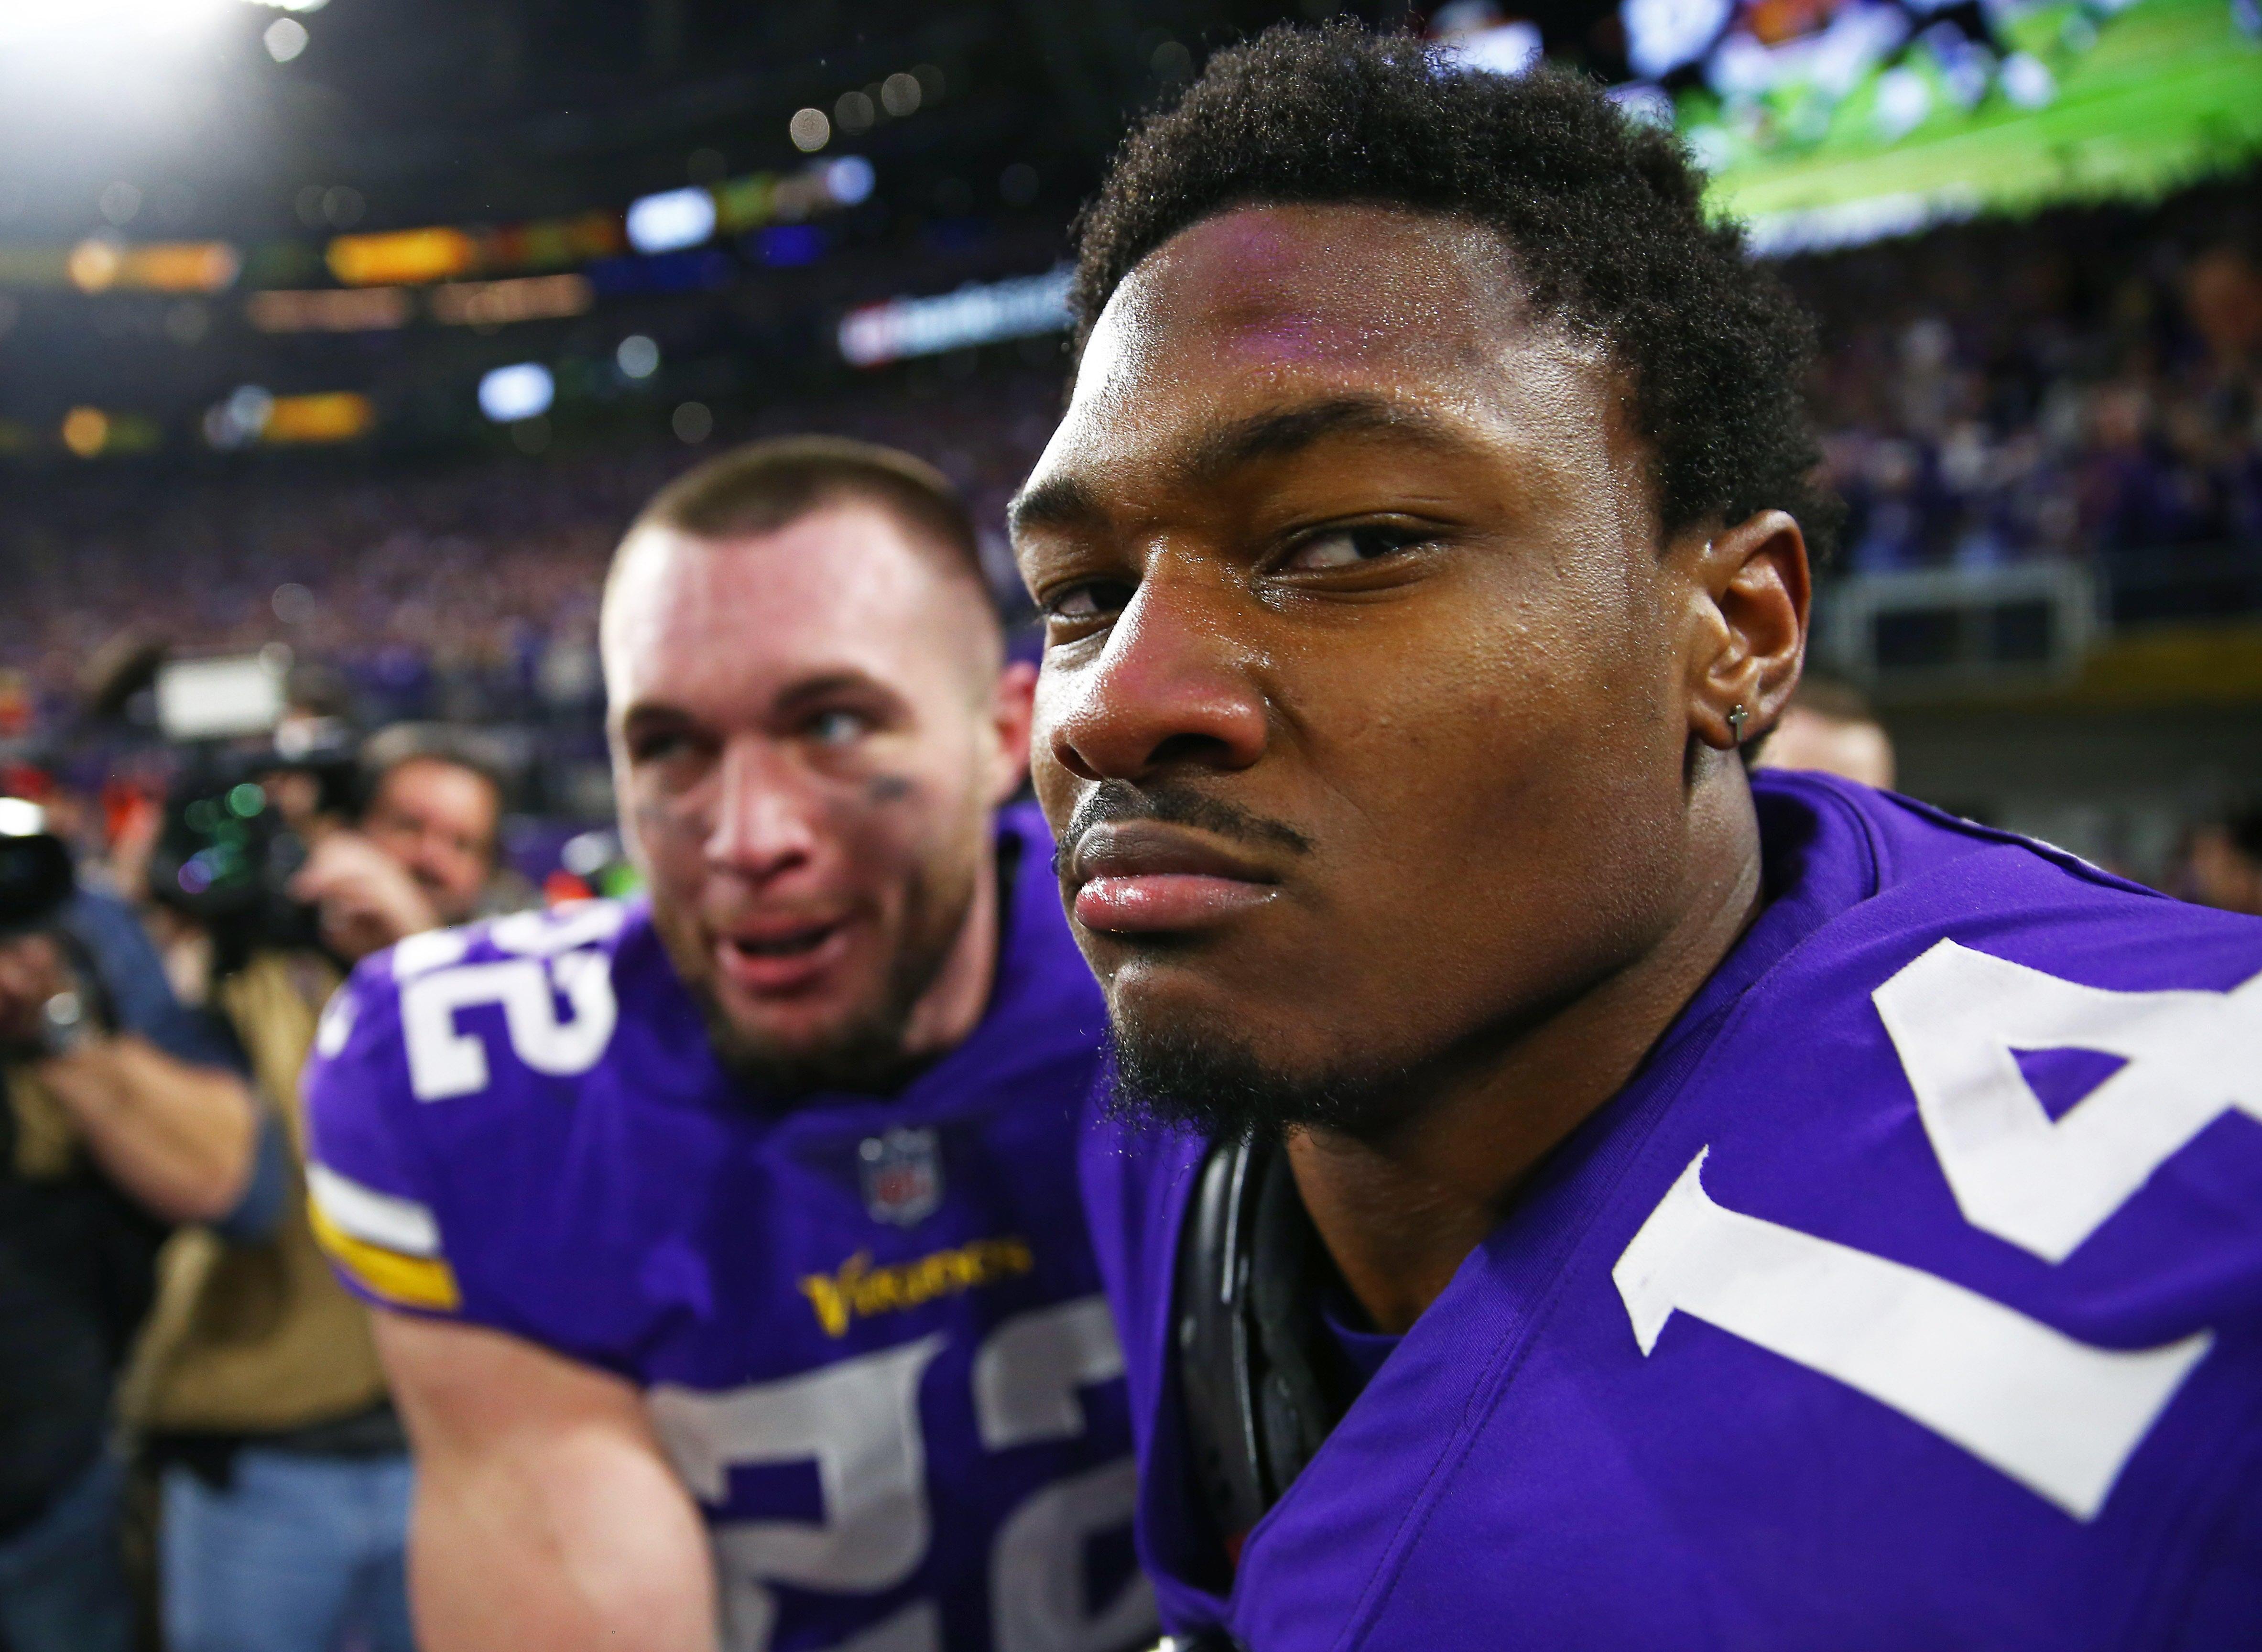 2018 NFL Playoffs Odds, Picks: Jags Keep It Close, Vikings Will Play Home Super Bowl